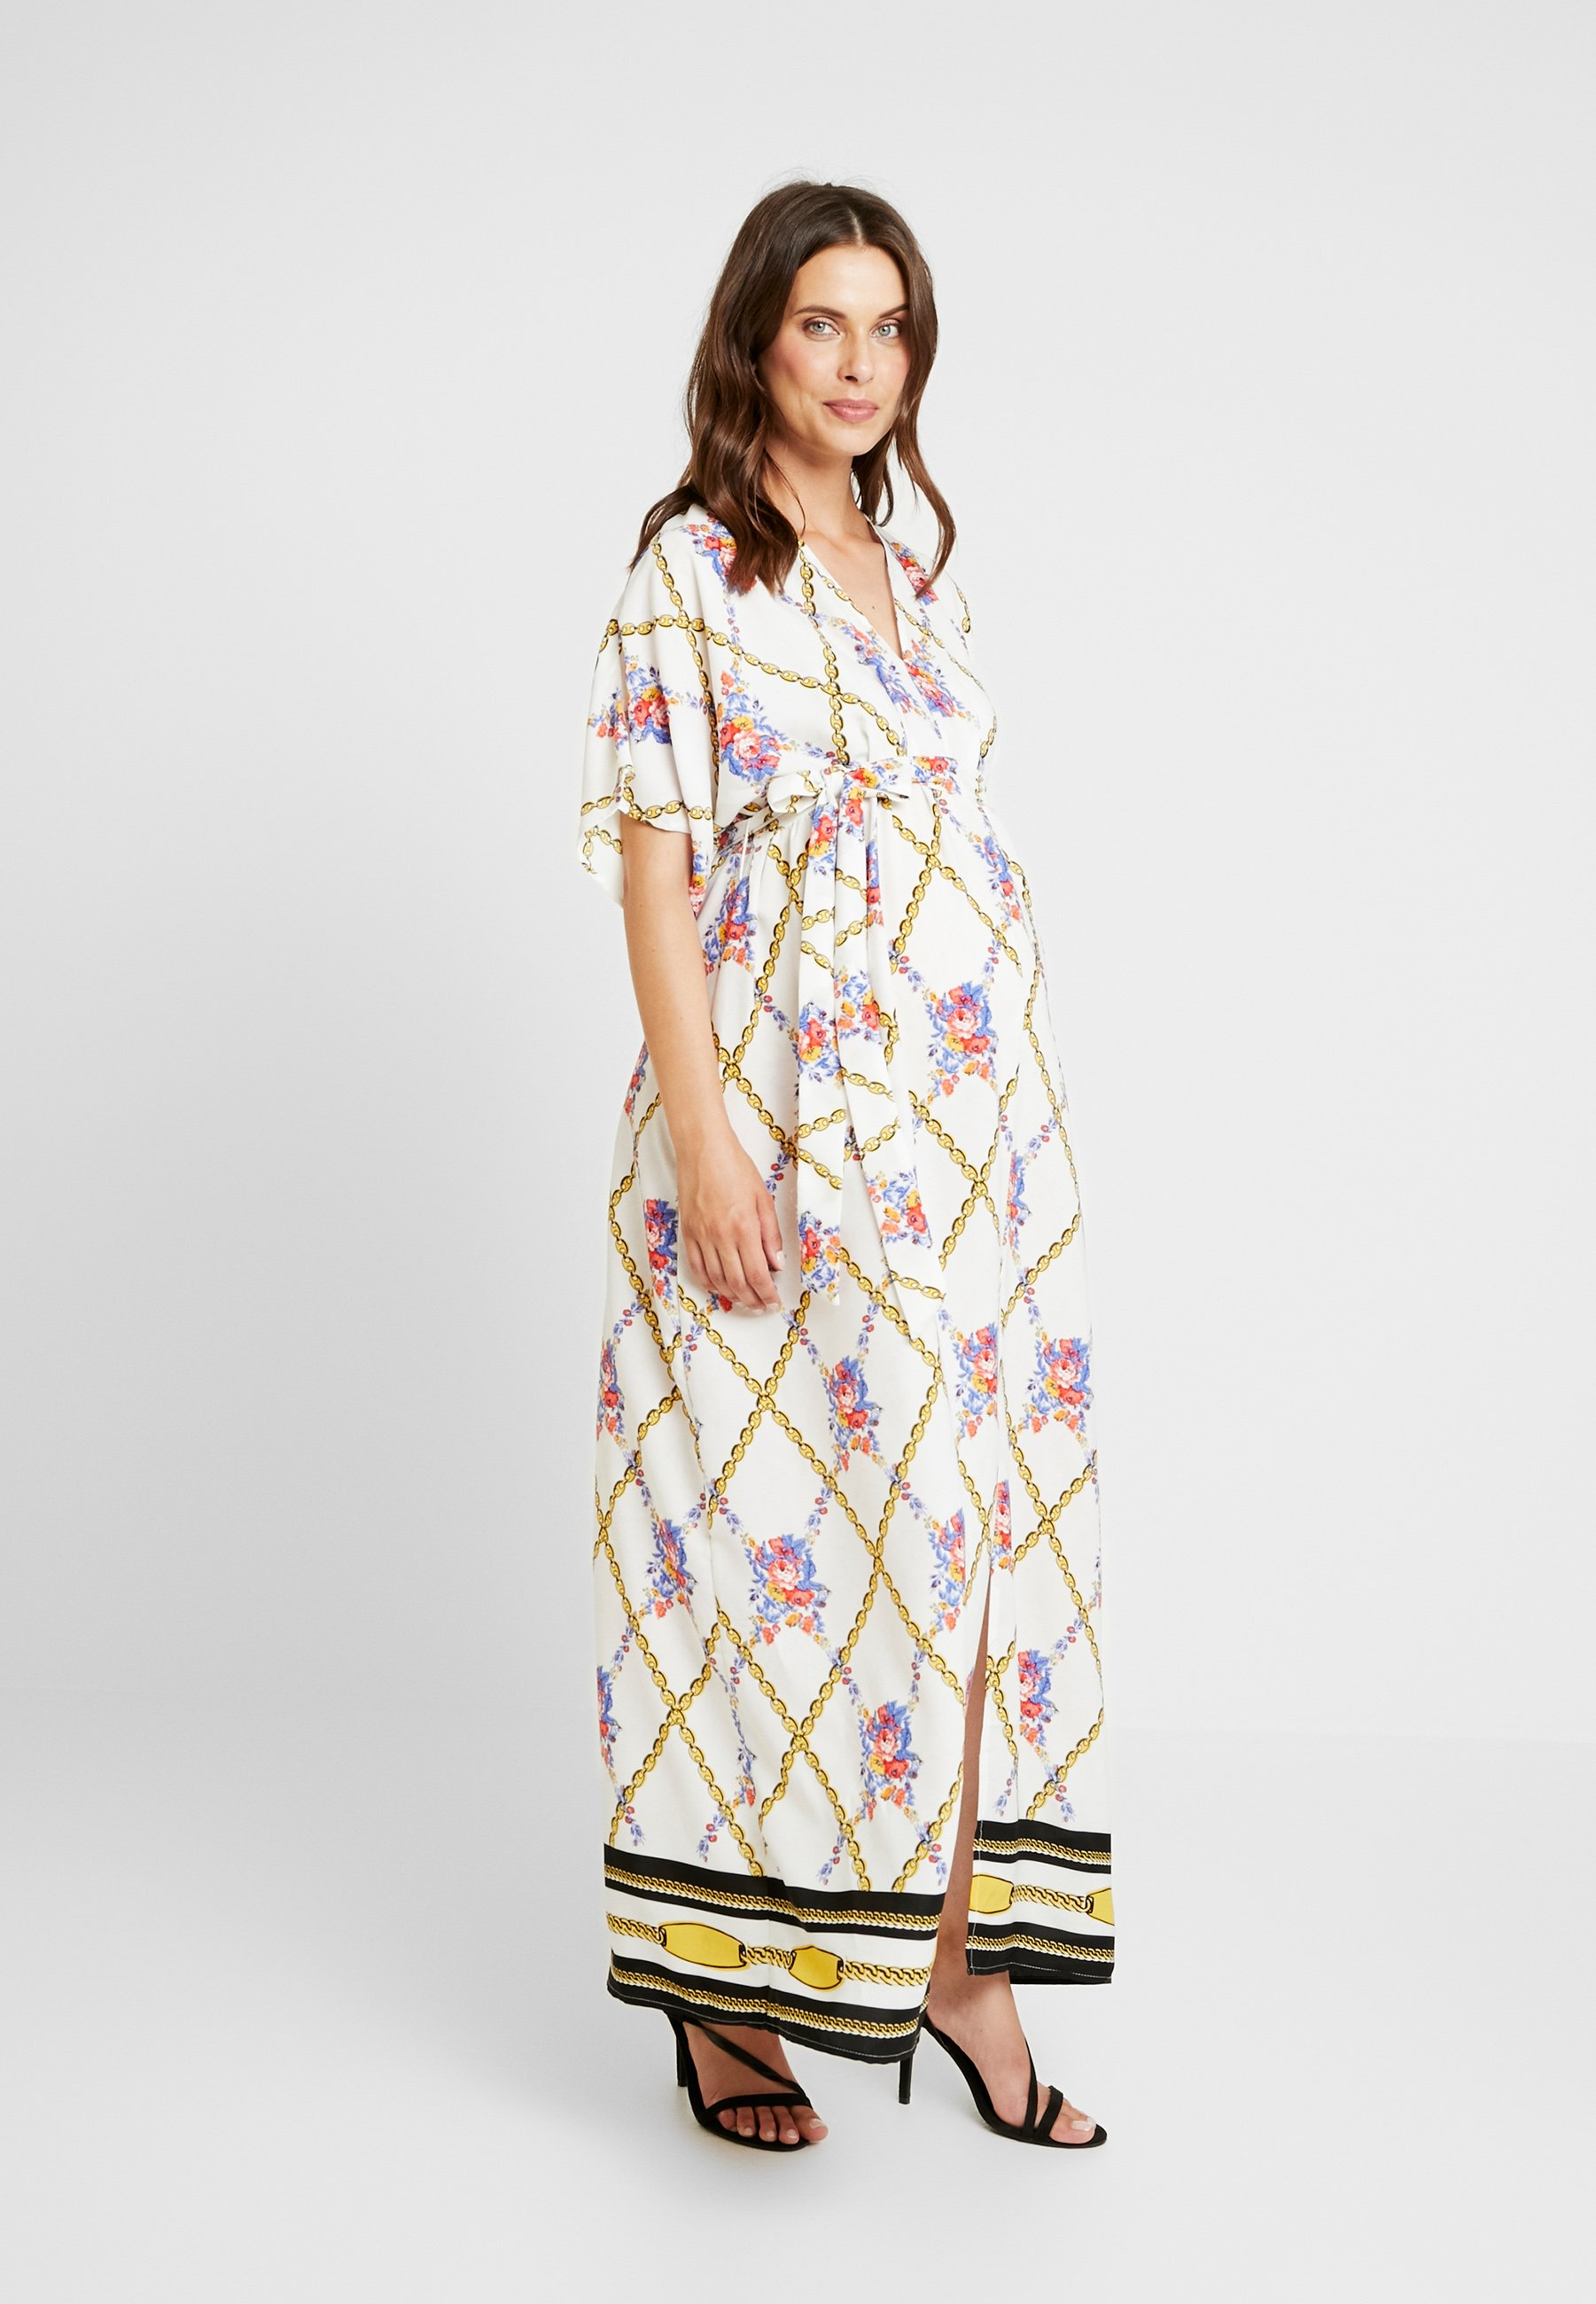 Bloom DressRobe Glamorous Scarf White Print Longue vNm08wn